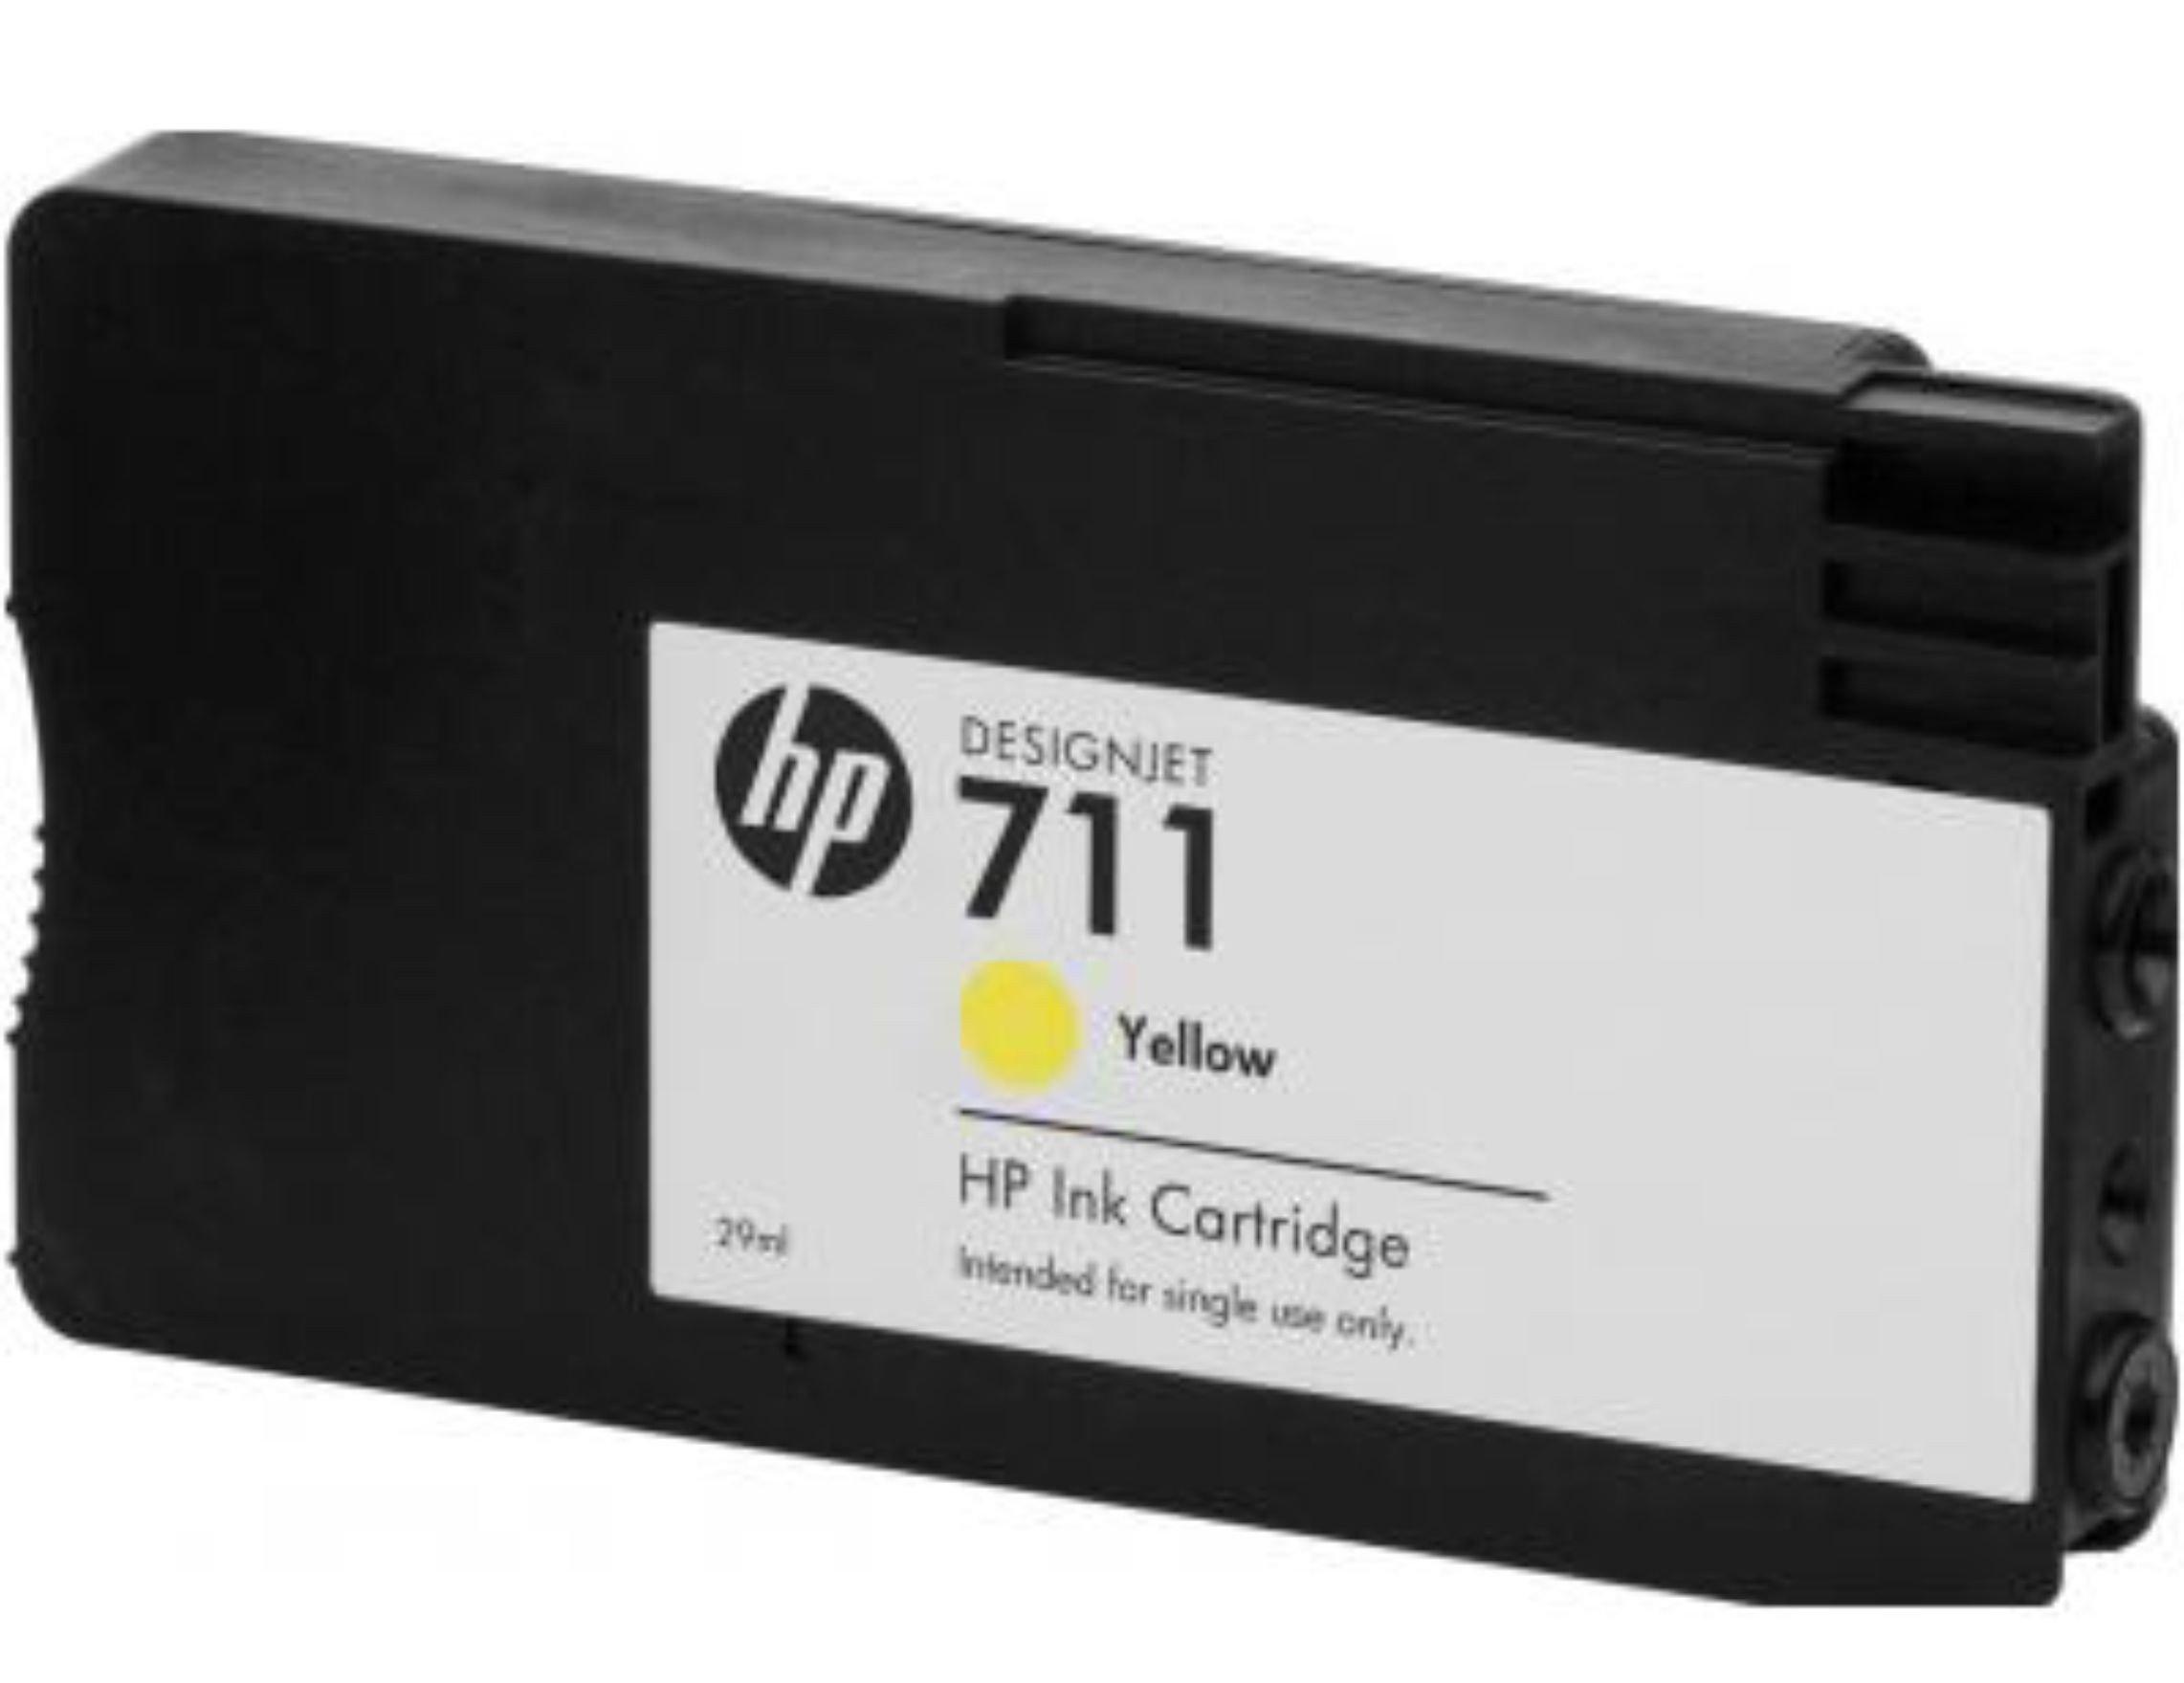 Cartucho de Tinta HP CZ132A Amarillo Compatible Con HP Designjet T520 Designjet T120 CZ132A H711 Pigment 29 ml: Amazon.es: Electrónica